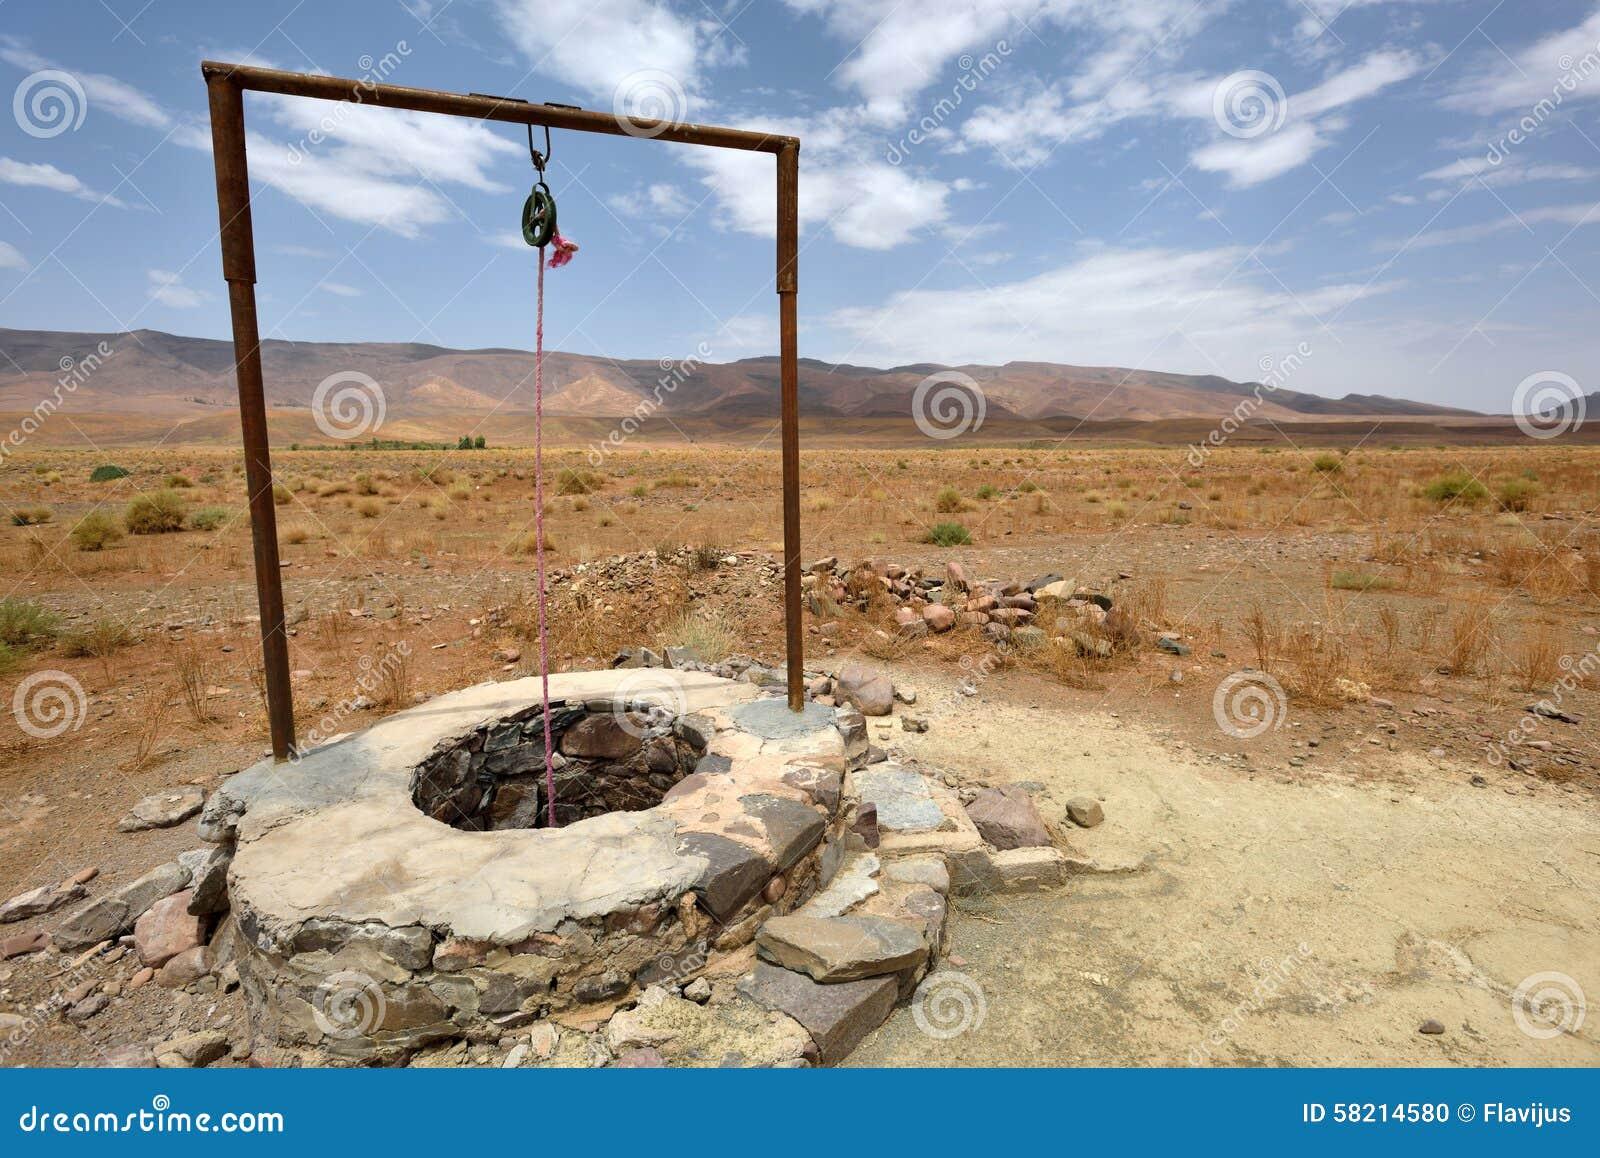 puits d 39 eau en sahara desert maroc photo stock image 58214580. Black Bedroom Furniture Sets. Home Design Ideas